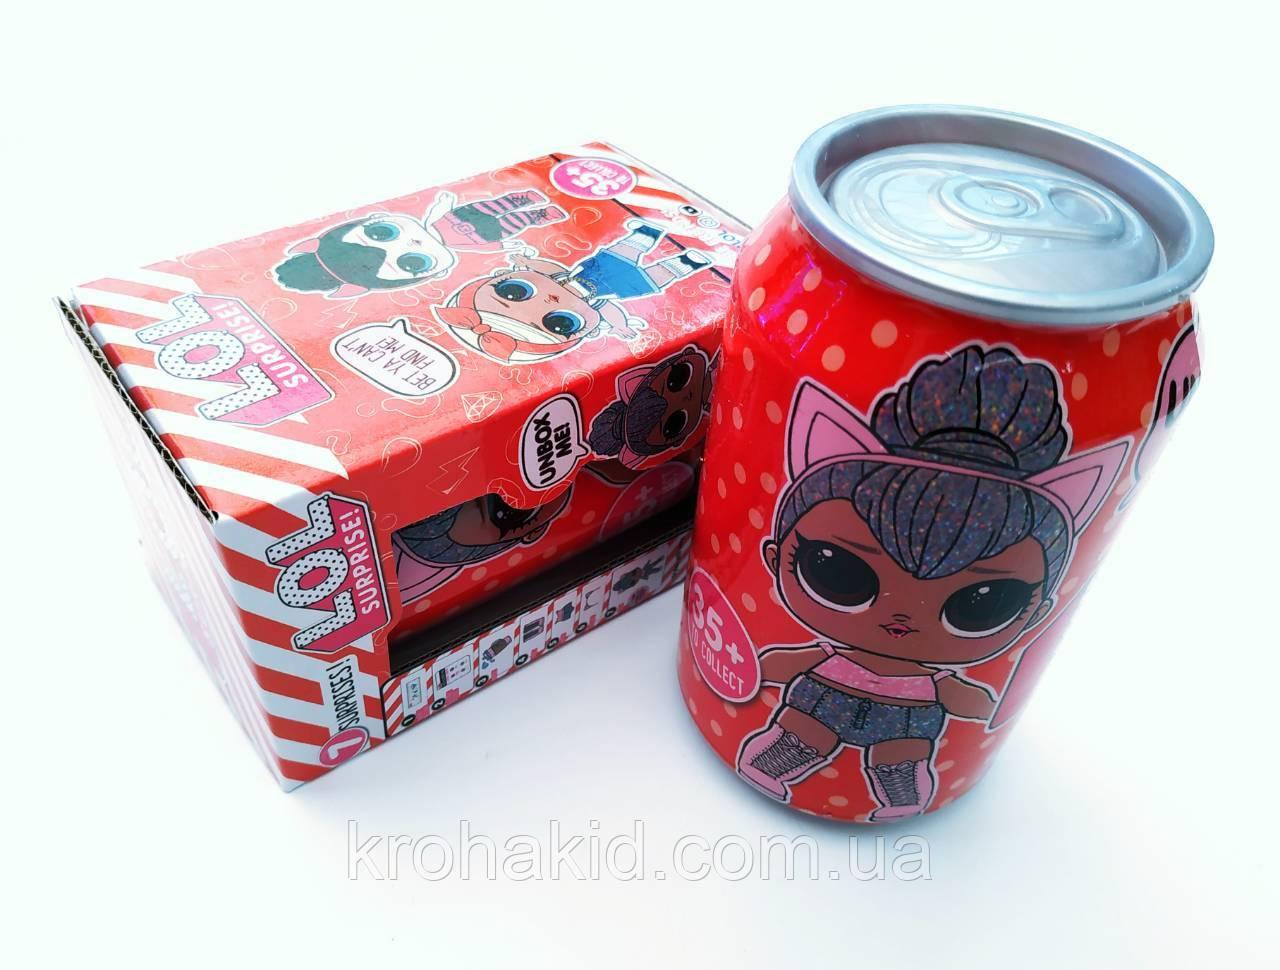 LOL баночка кока-кола / баночка Лол аналог